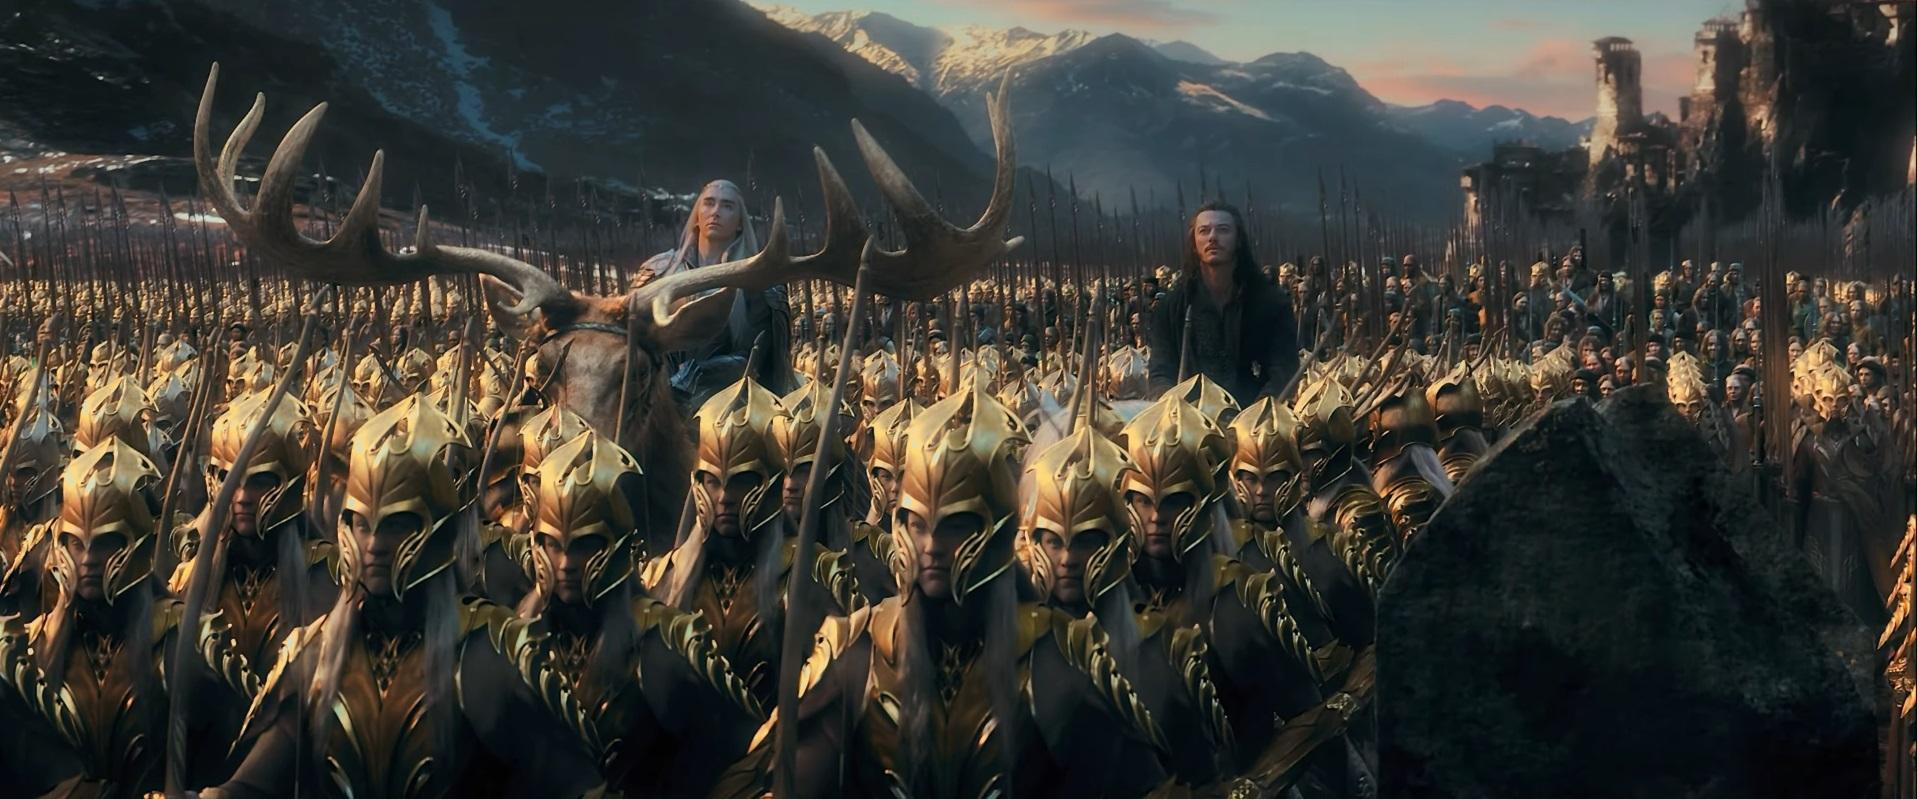 Bilderesultat for five army battle the hobbit